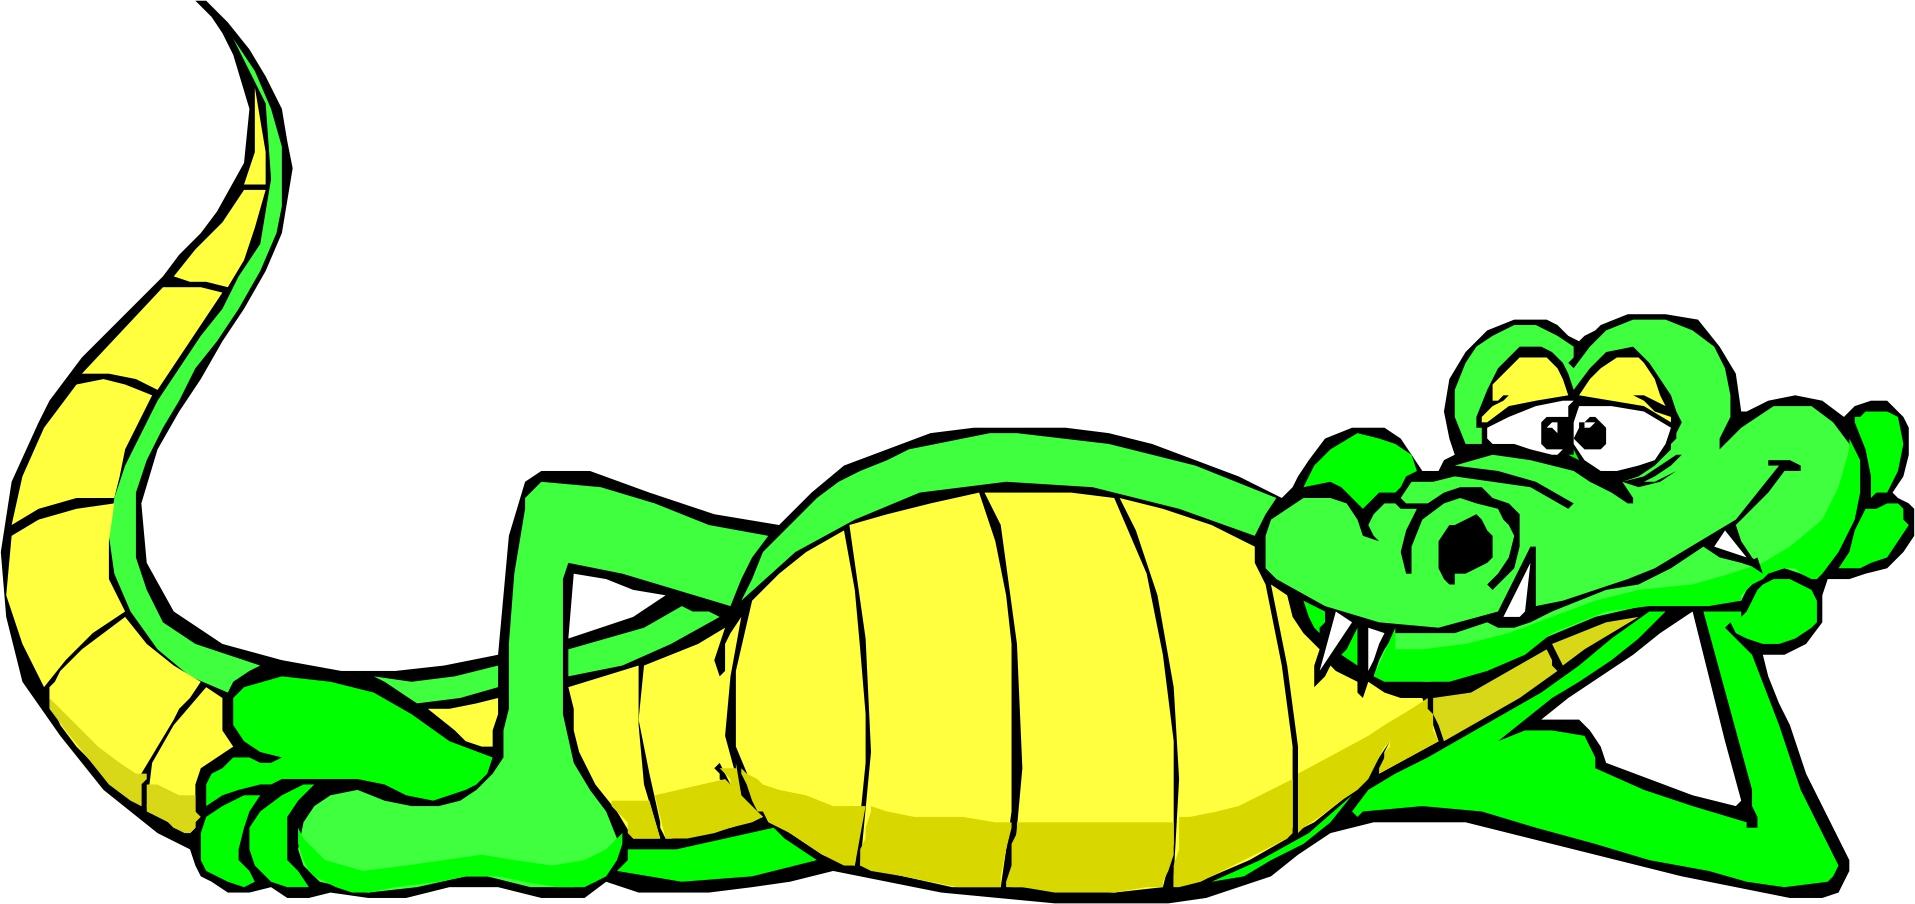 1915x904 Free Clip Art Alligator Clipart Image